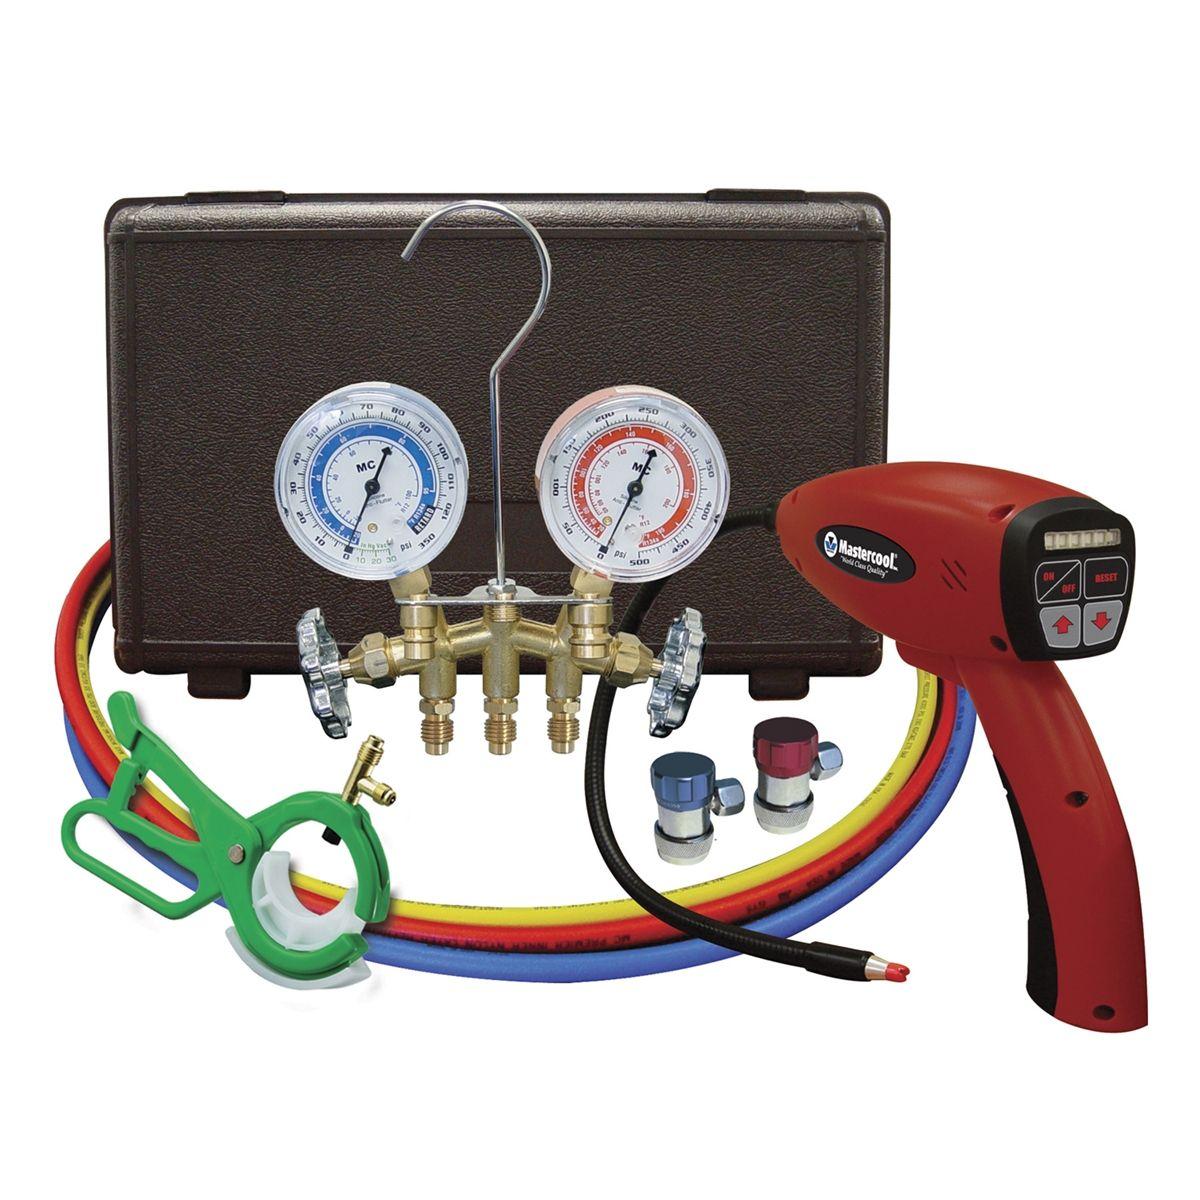 Electronic Auto Gauge Set : Mastercool electronic leak detector with brass gauge set